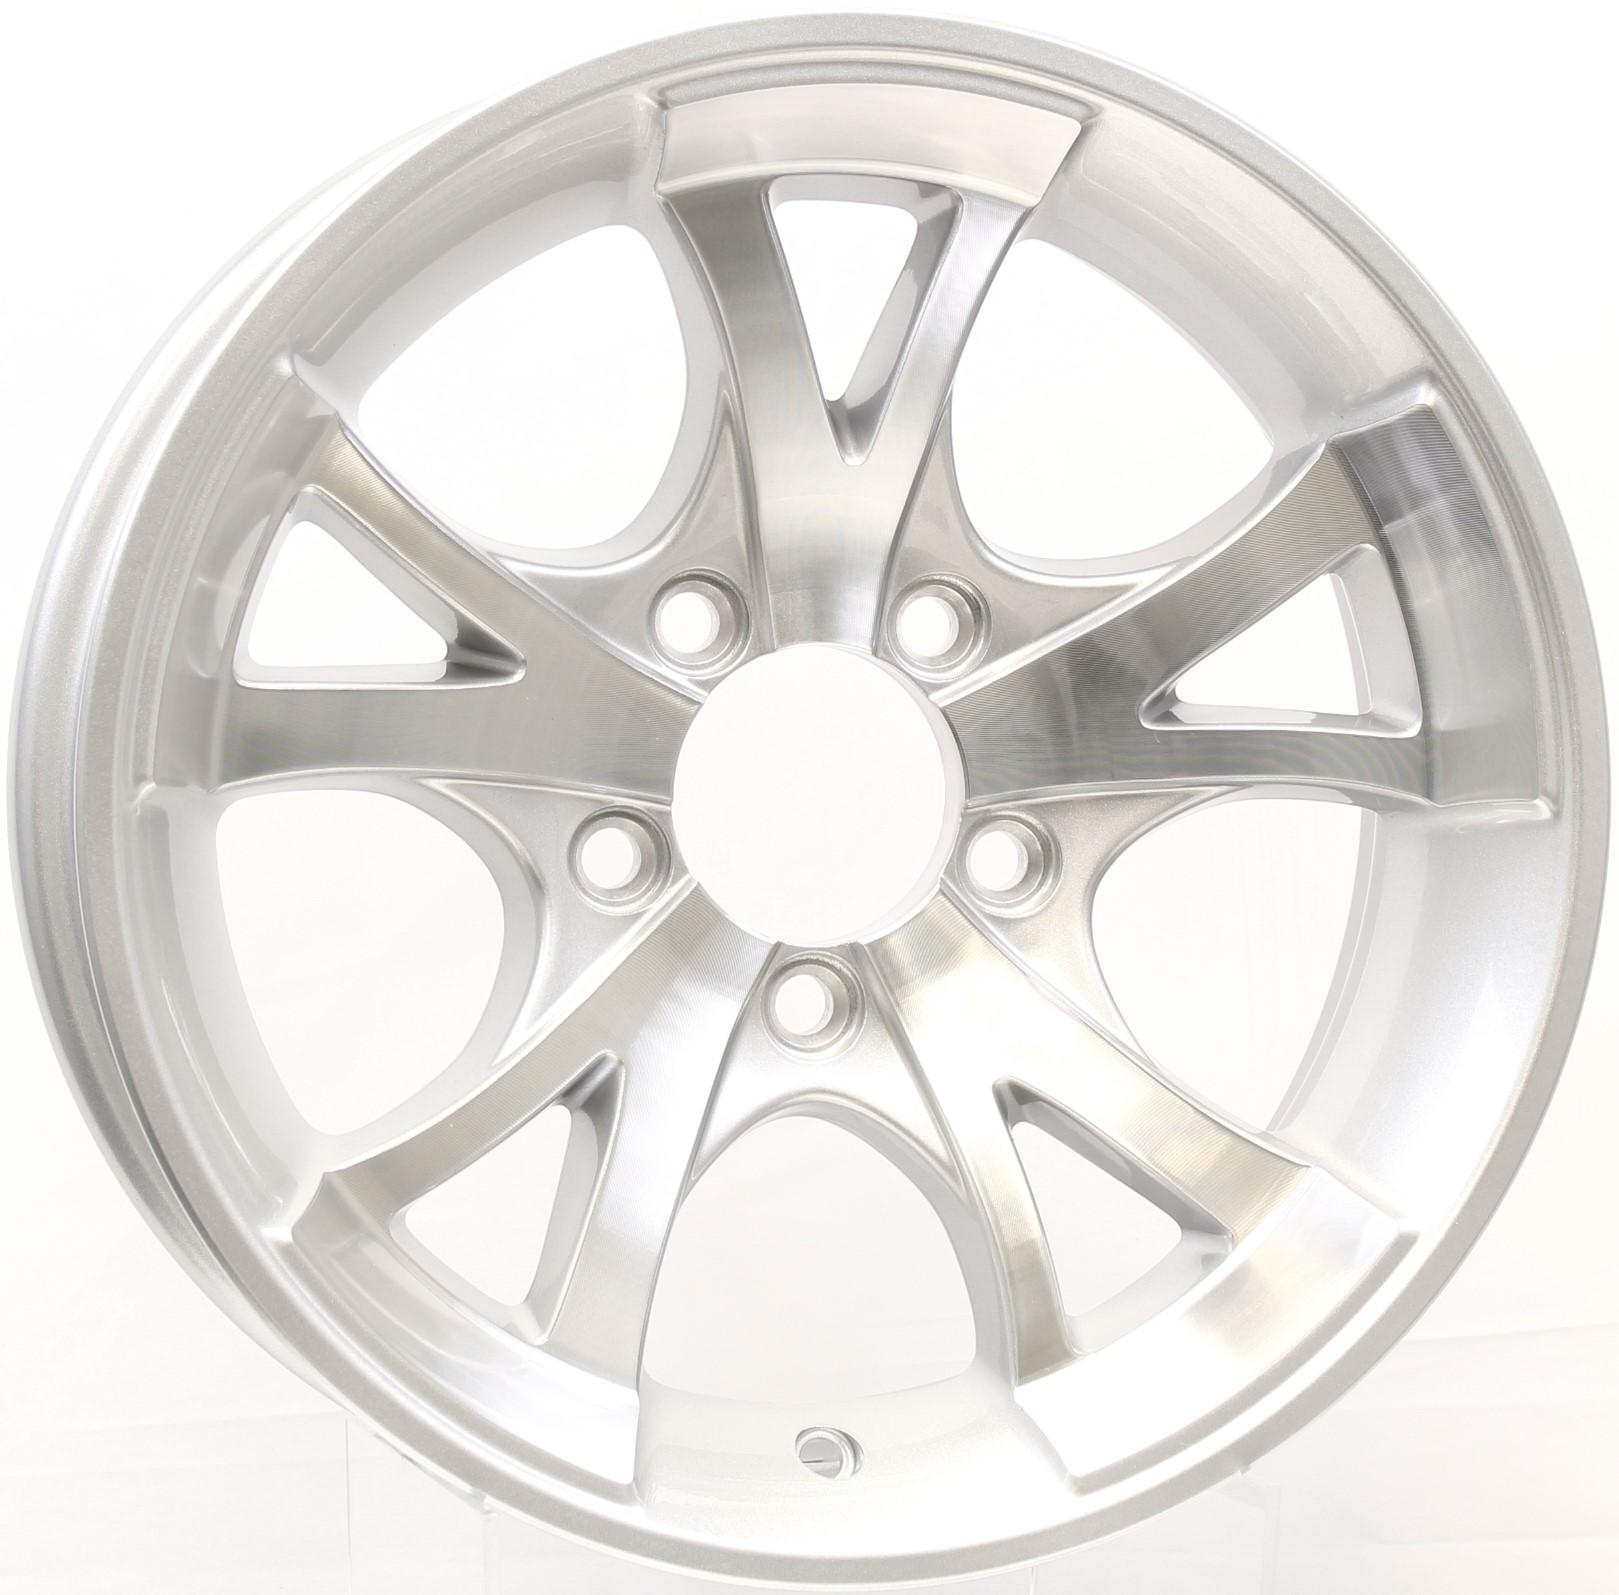 A411- 13x5 5-4.5Silver Aluminum Trailer Wheel Image